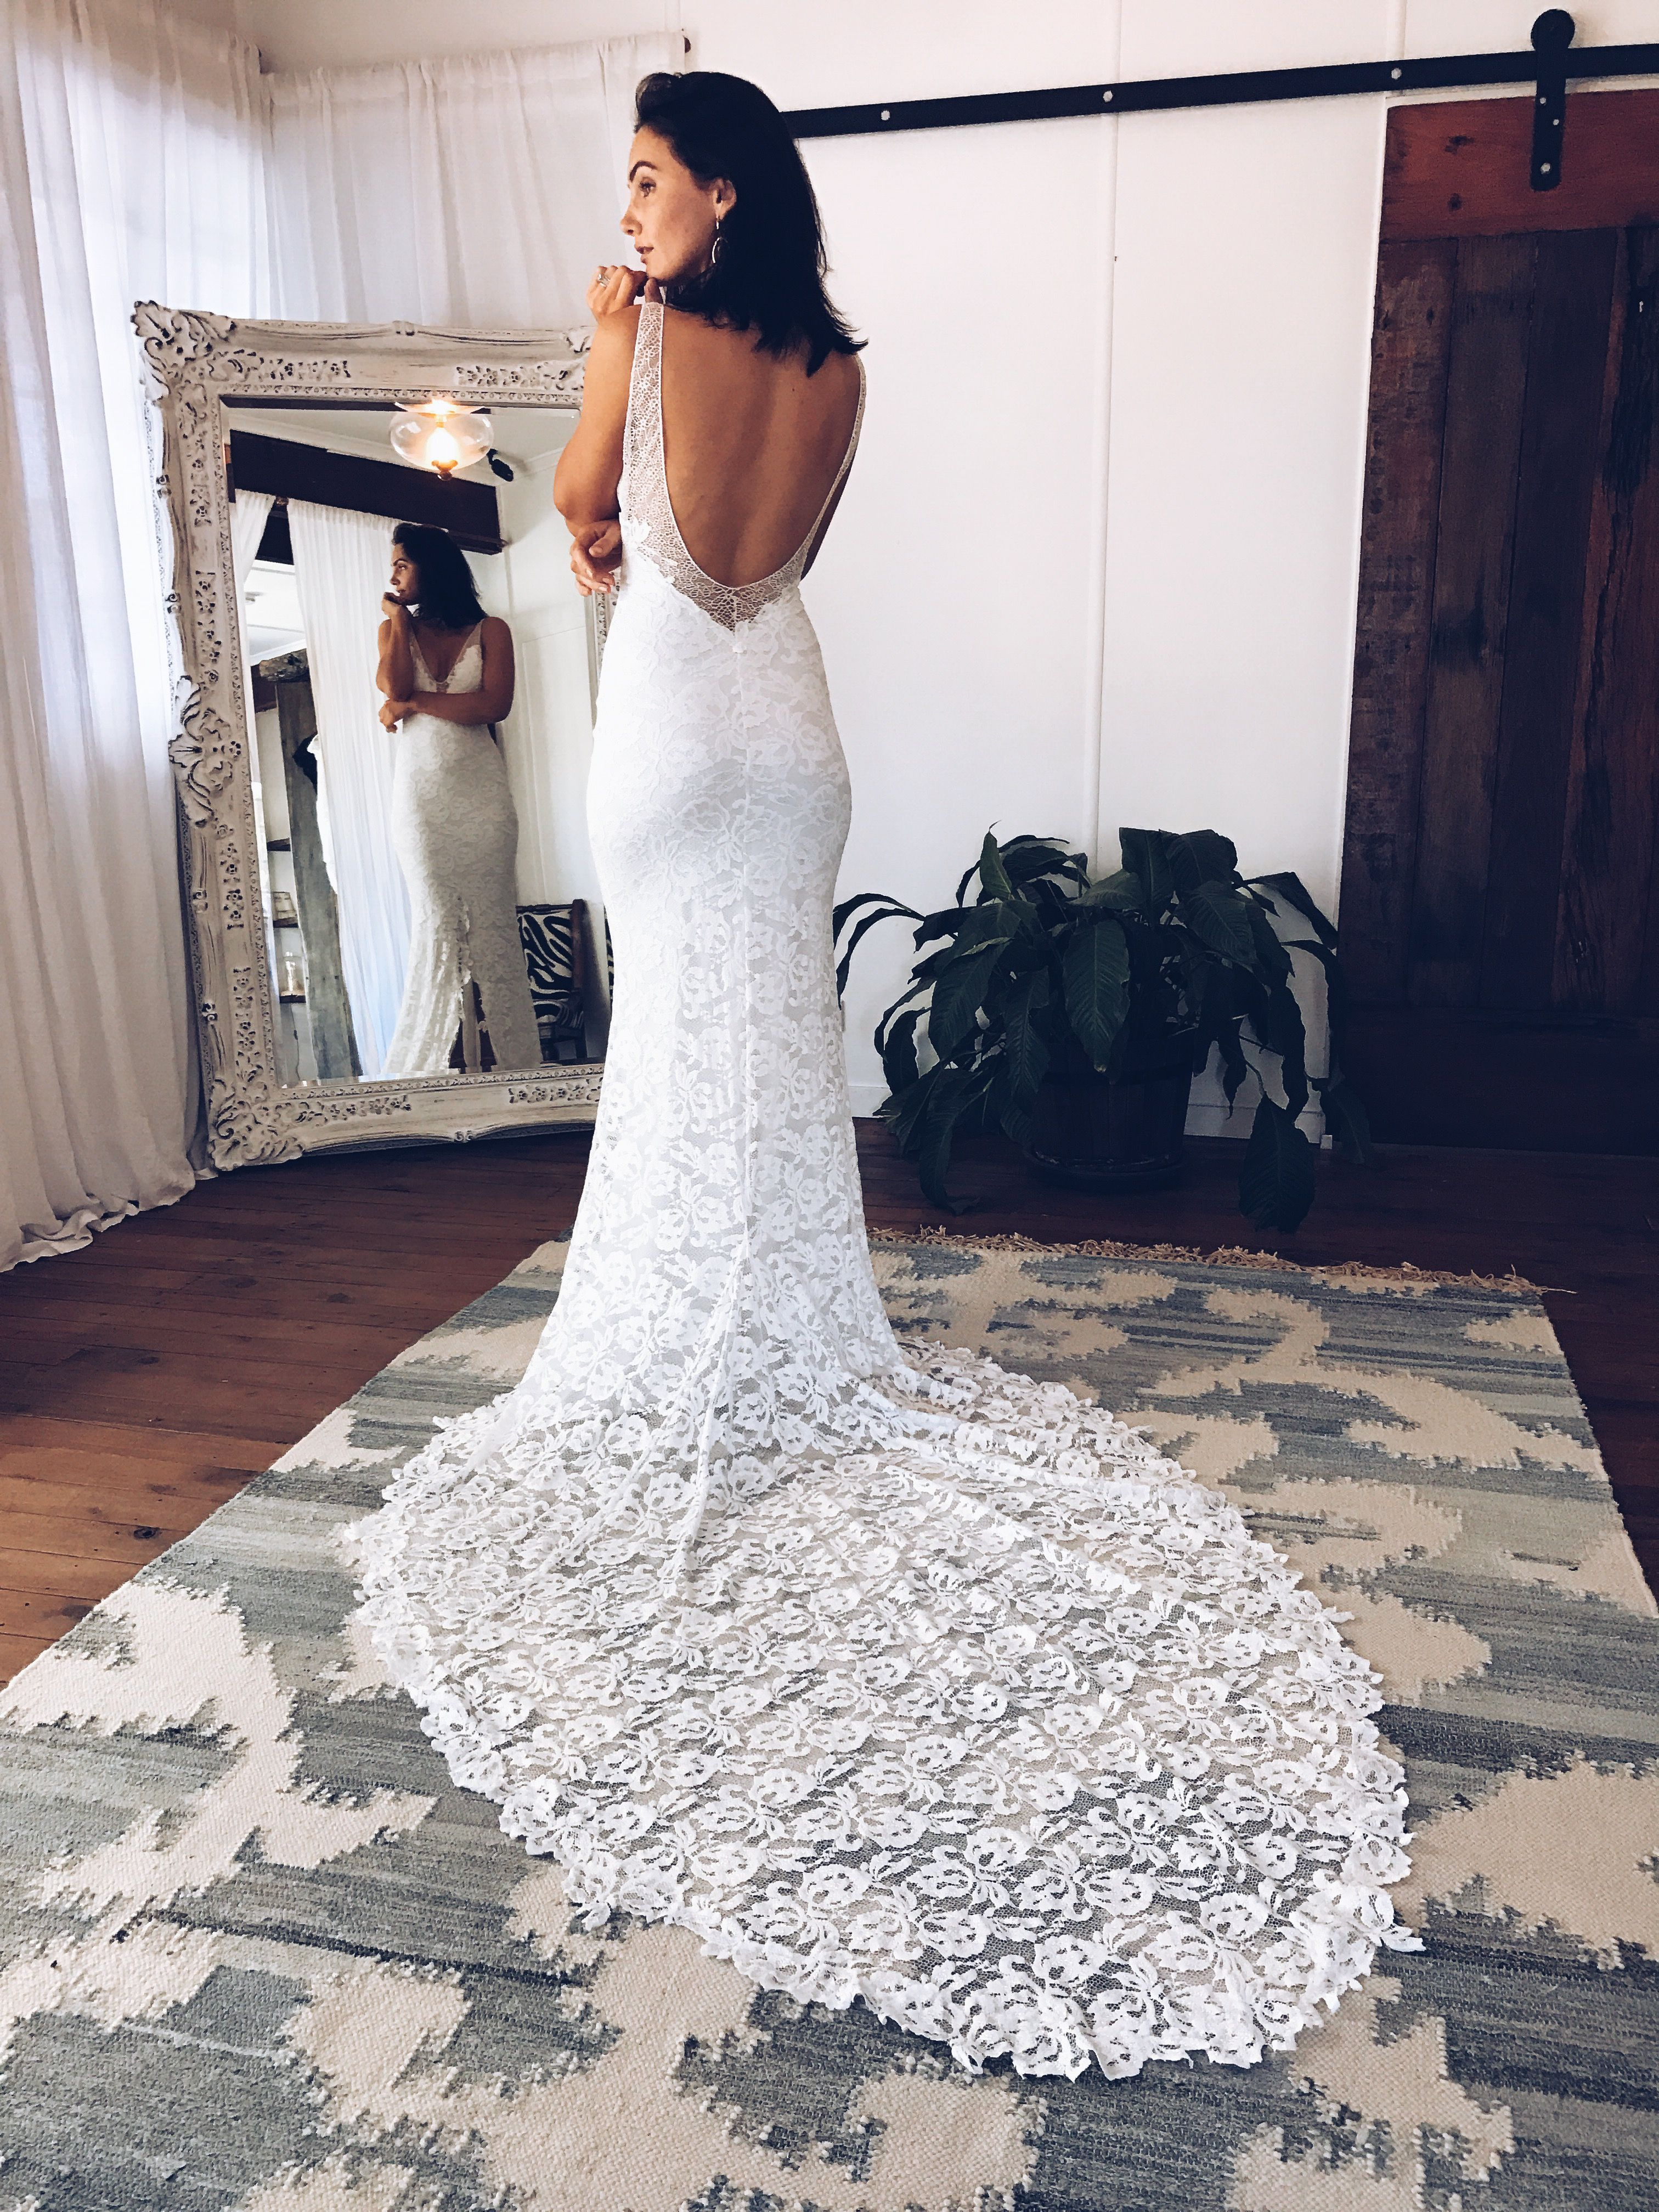 Shop Gia Lace beach wedding dress, Lace mermaid wedding